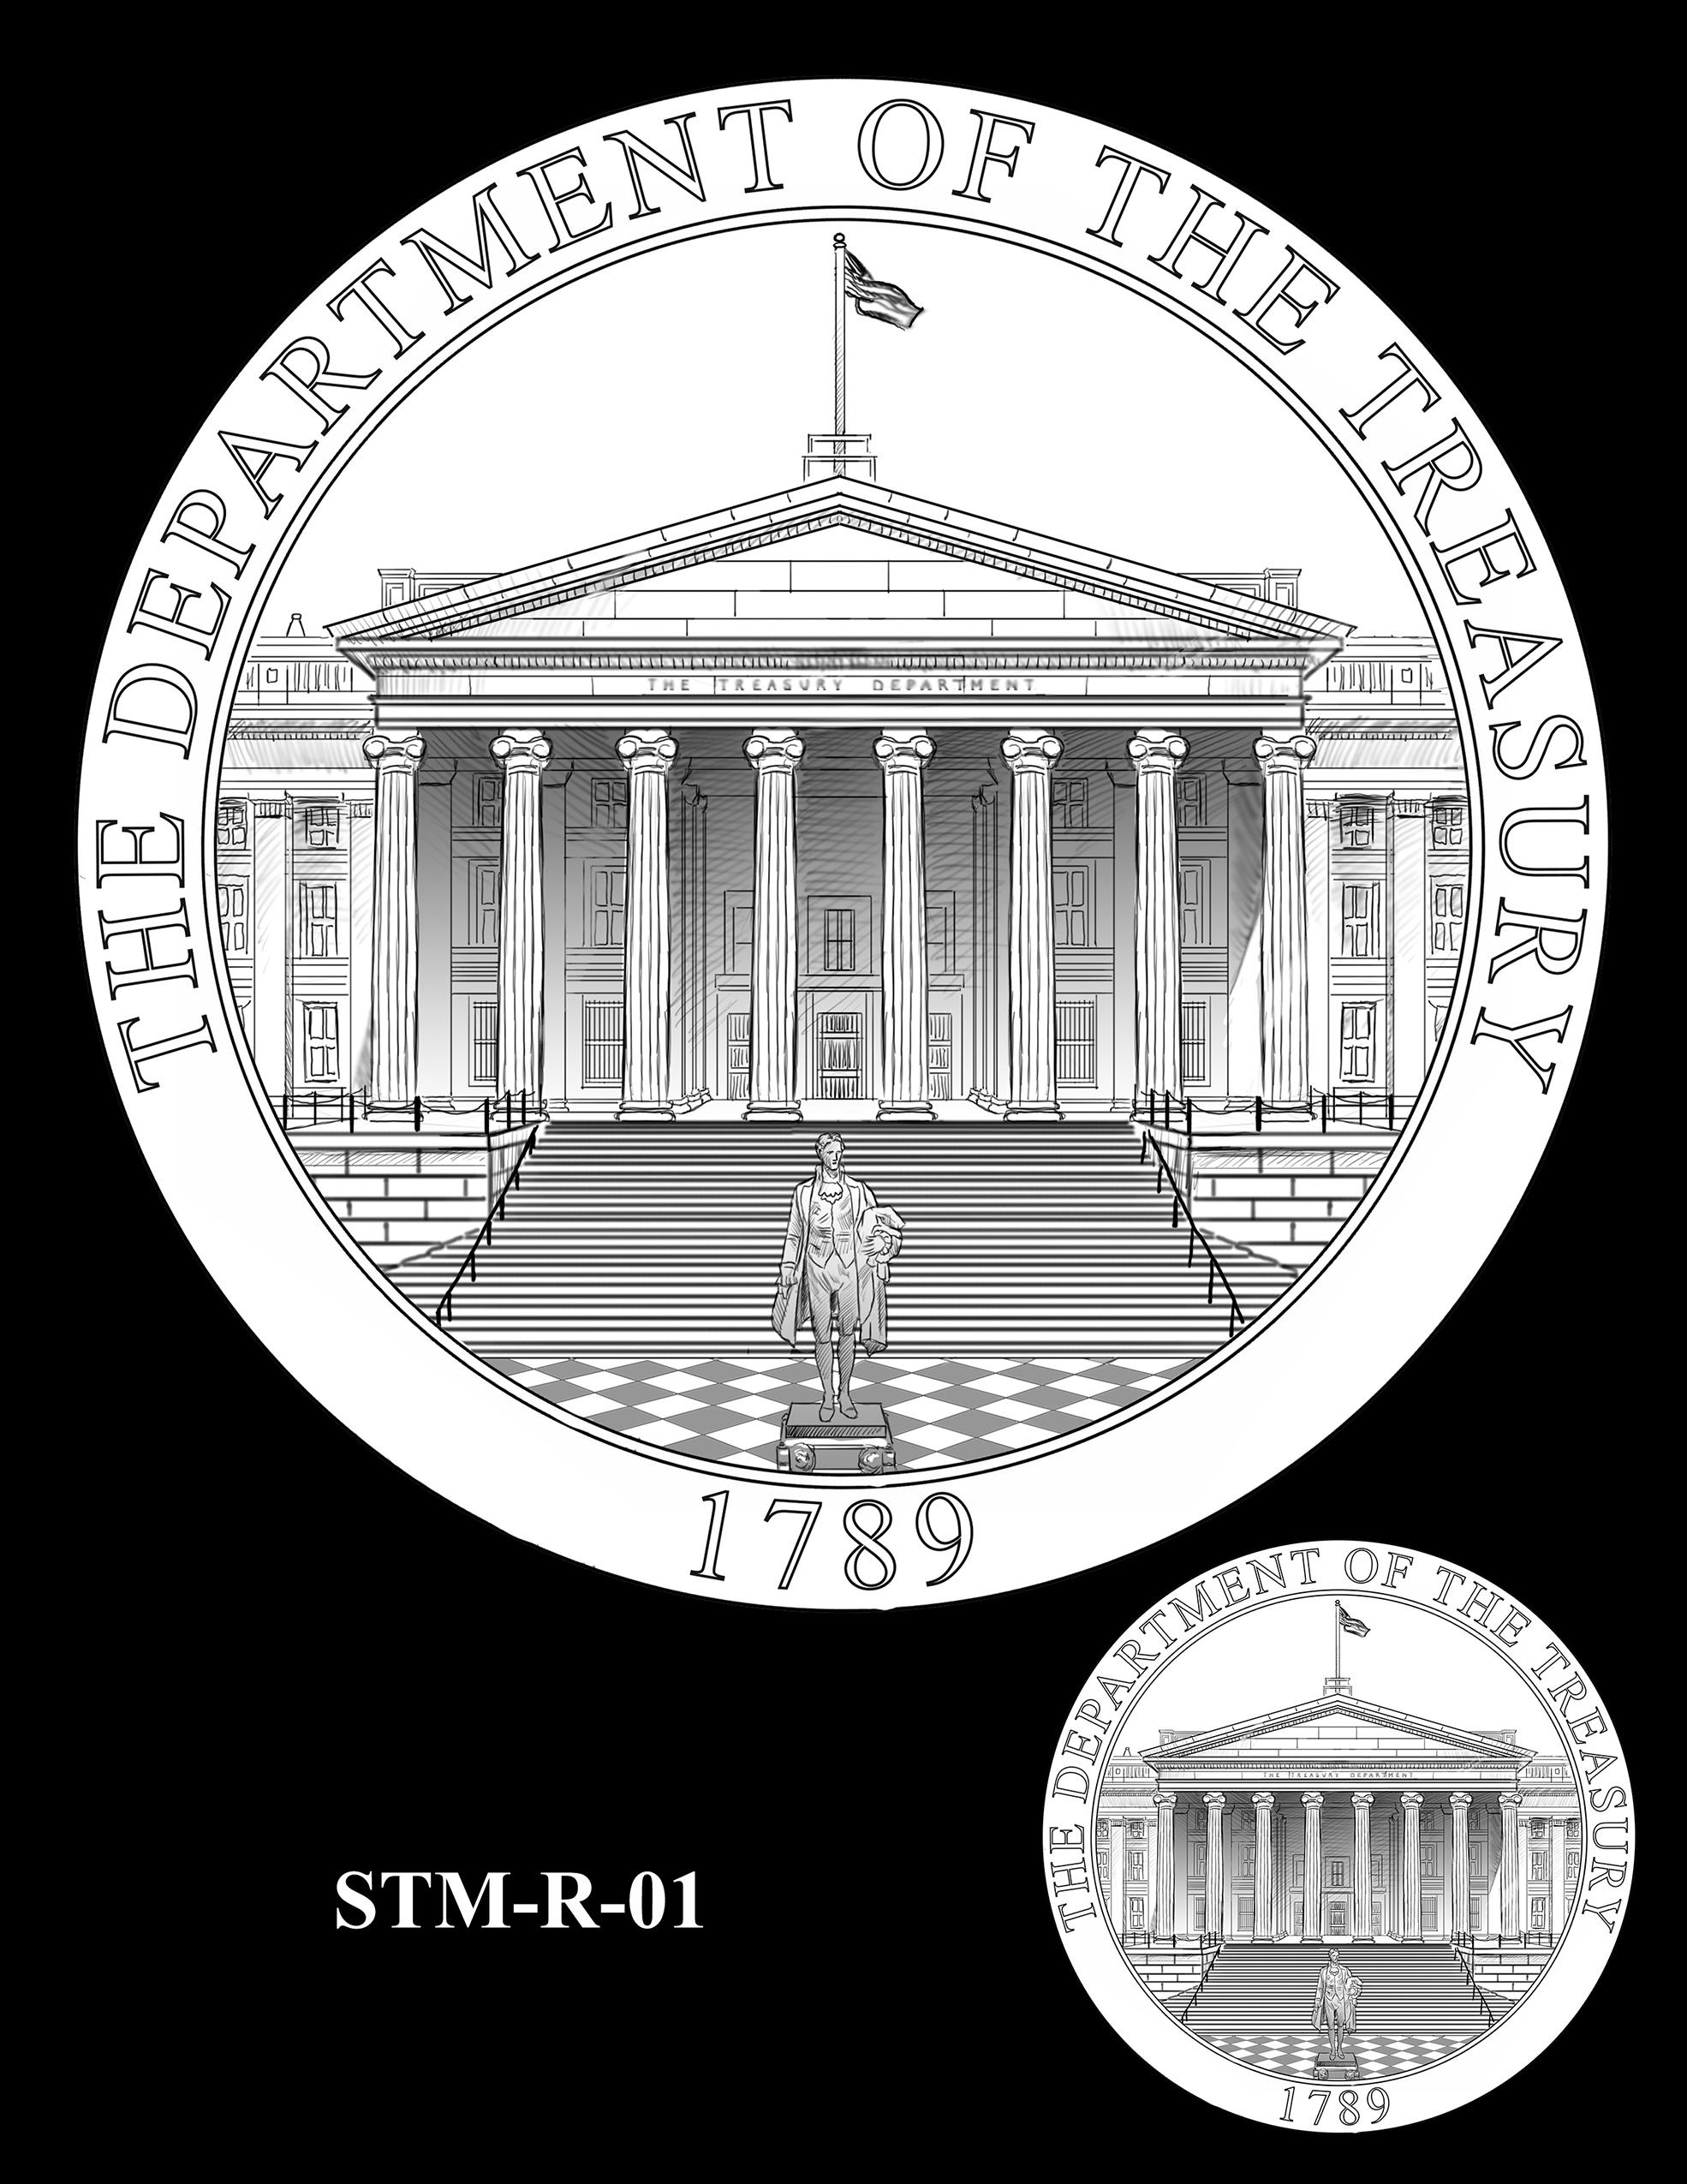 STM-R-01 -- Steven T. Mnuchin Secretary of the Treasury Medal